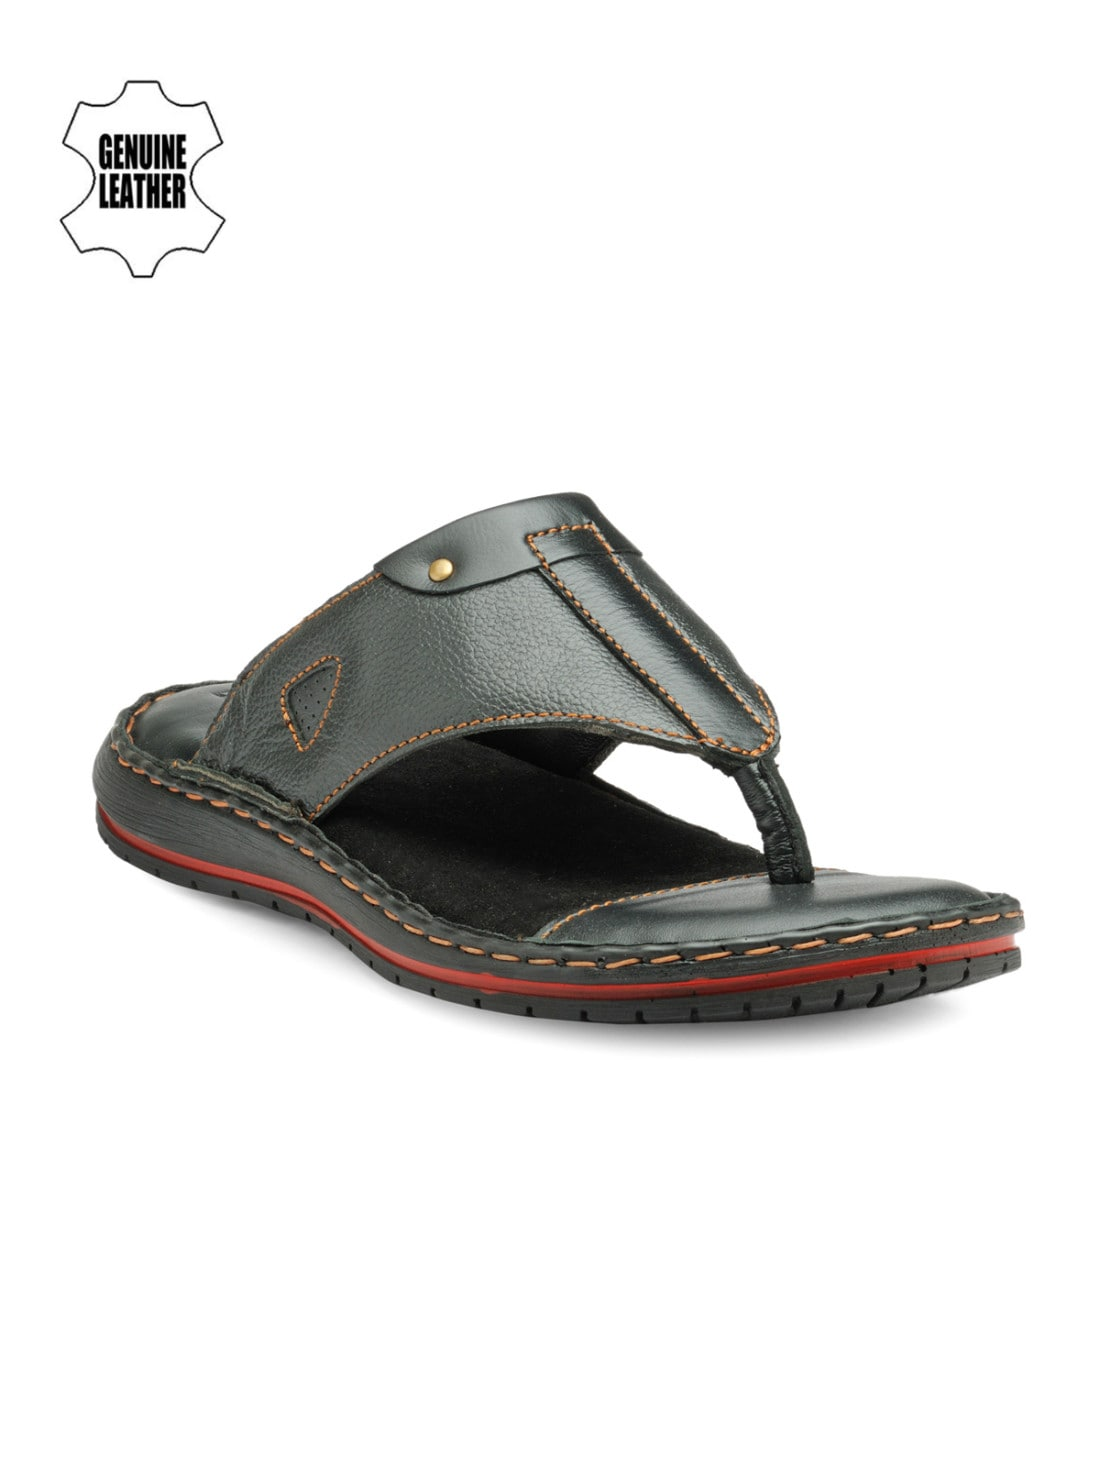 0bc0c1ea66e51f Men Black Casual Sandal - Buy Men Black Casual Sandal online in India